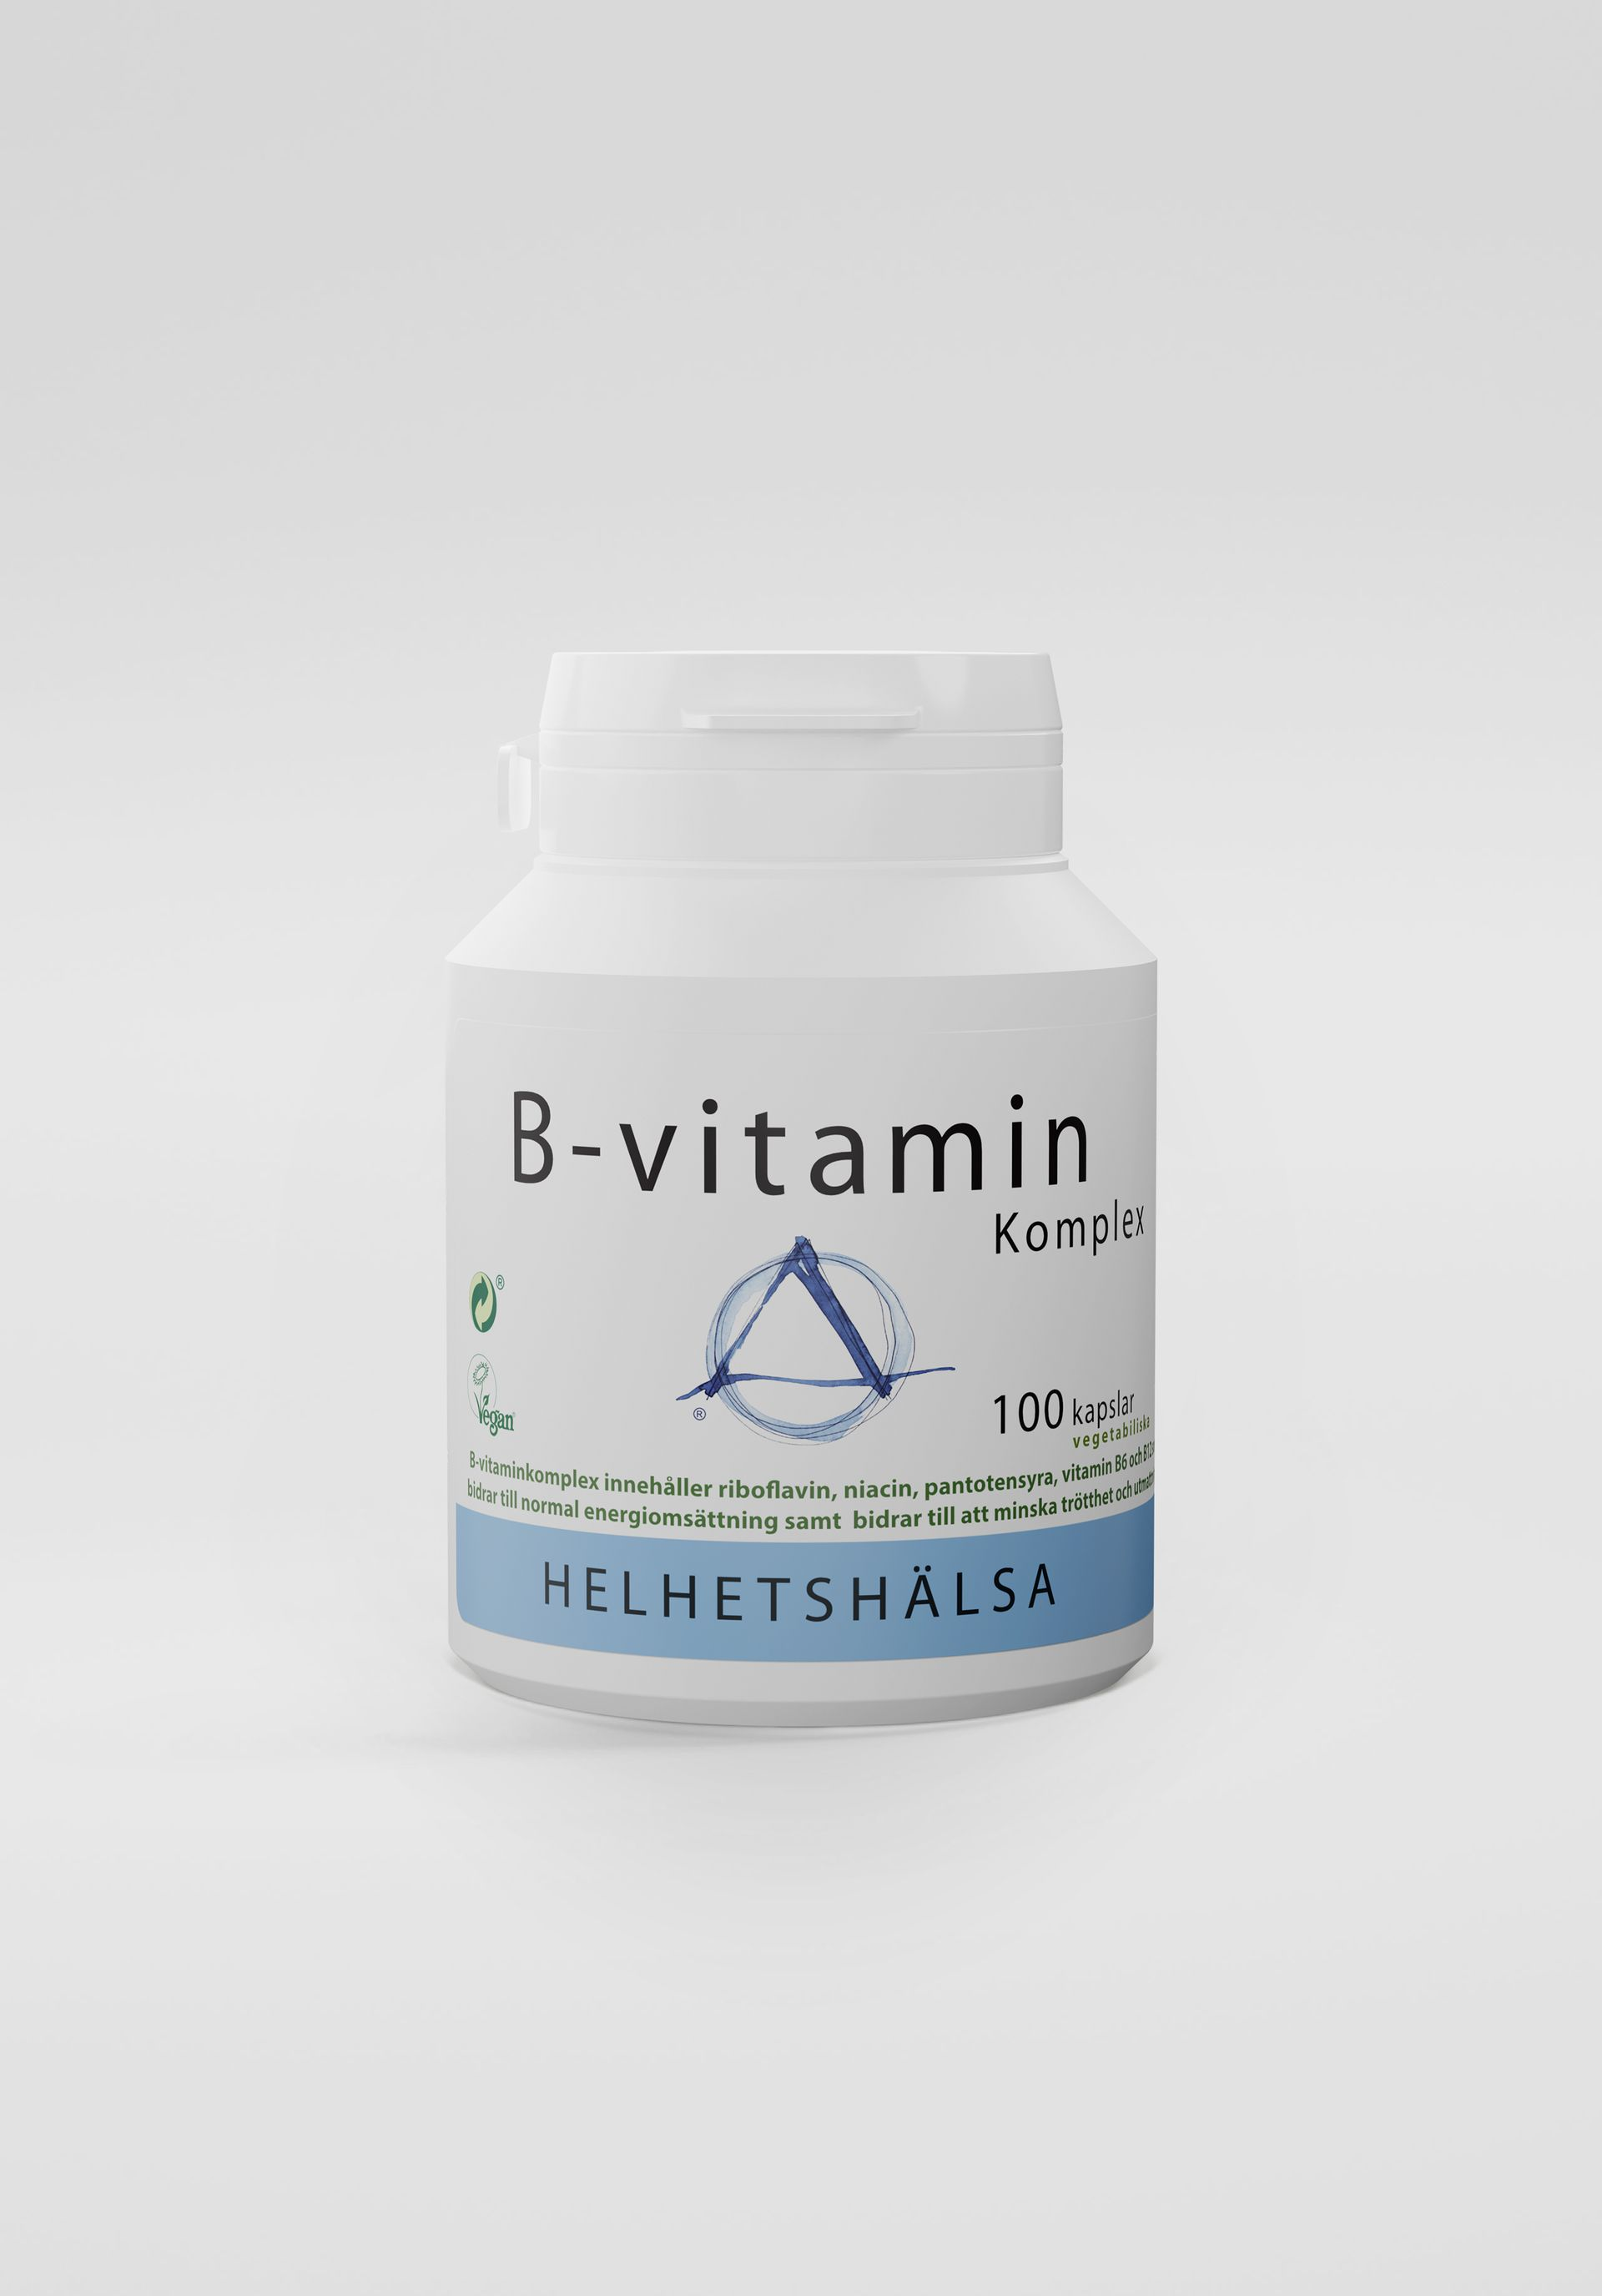 B-vitaminkomplex, 100 kapslar